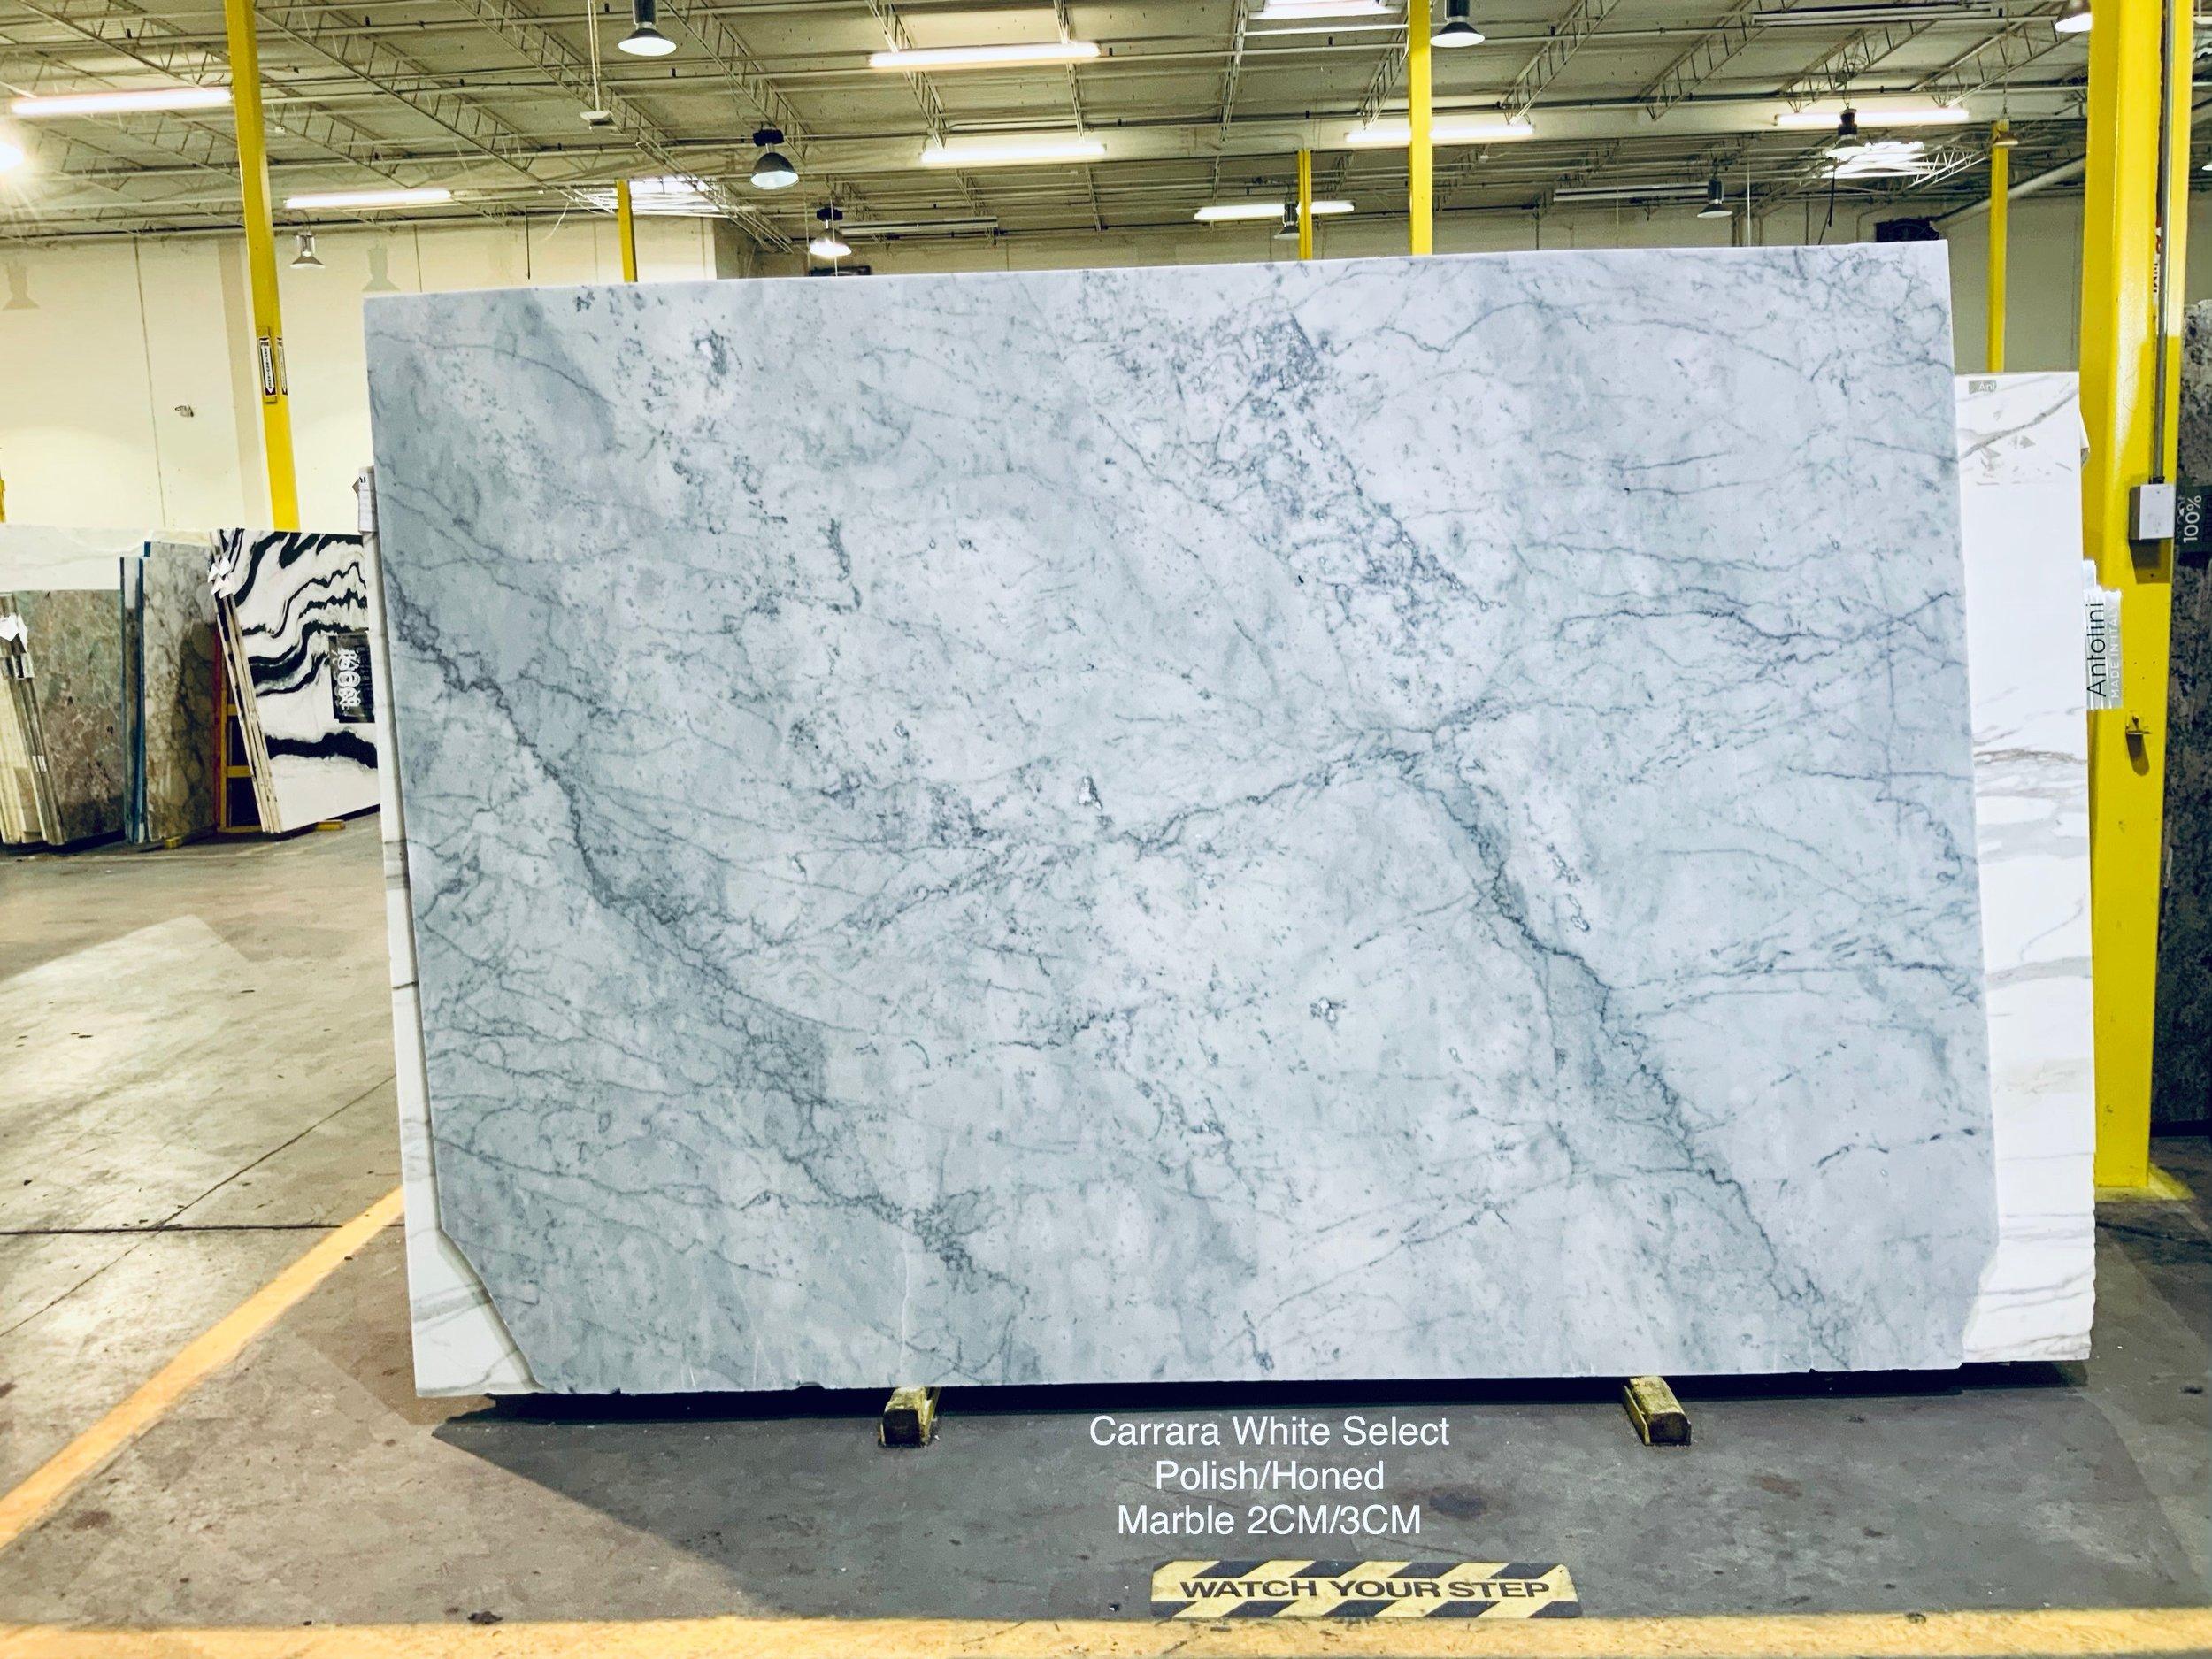 Carrara White Select